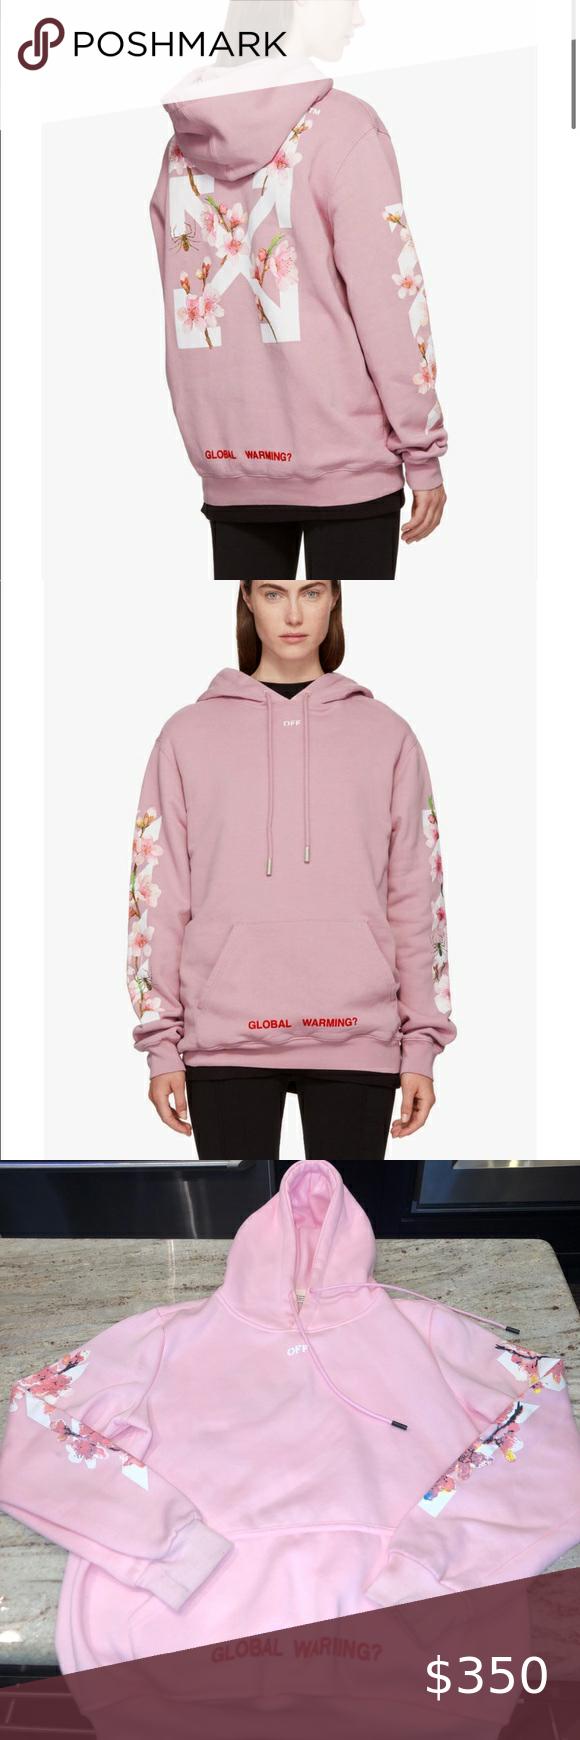 Off White Pink Cherry Blossom Sweatshirt Fashion Clothes Design Fashion Tips [ 1740 x 580 Pixel ]